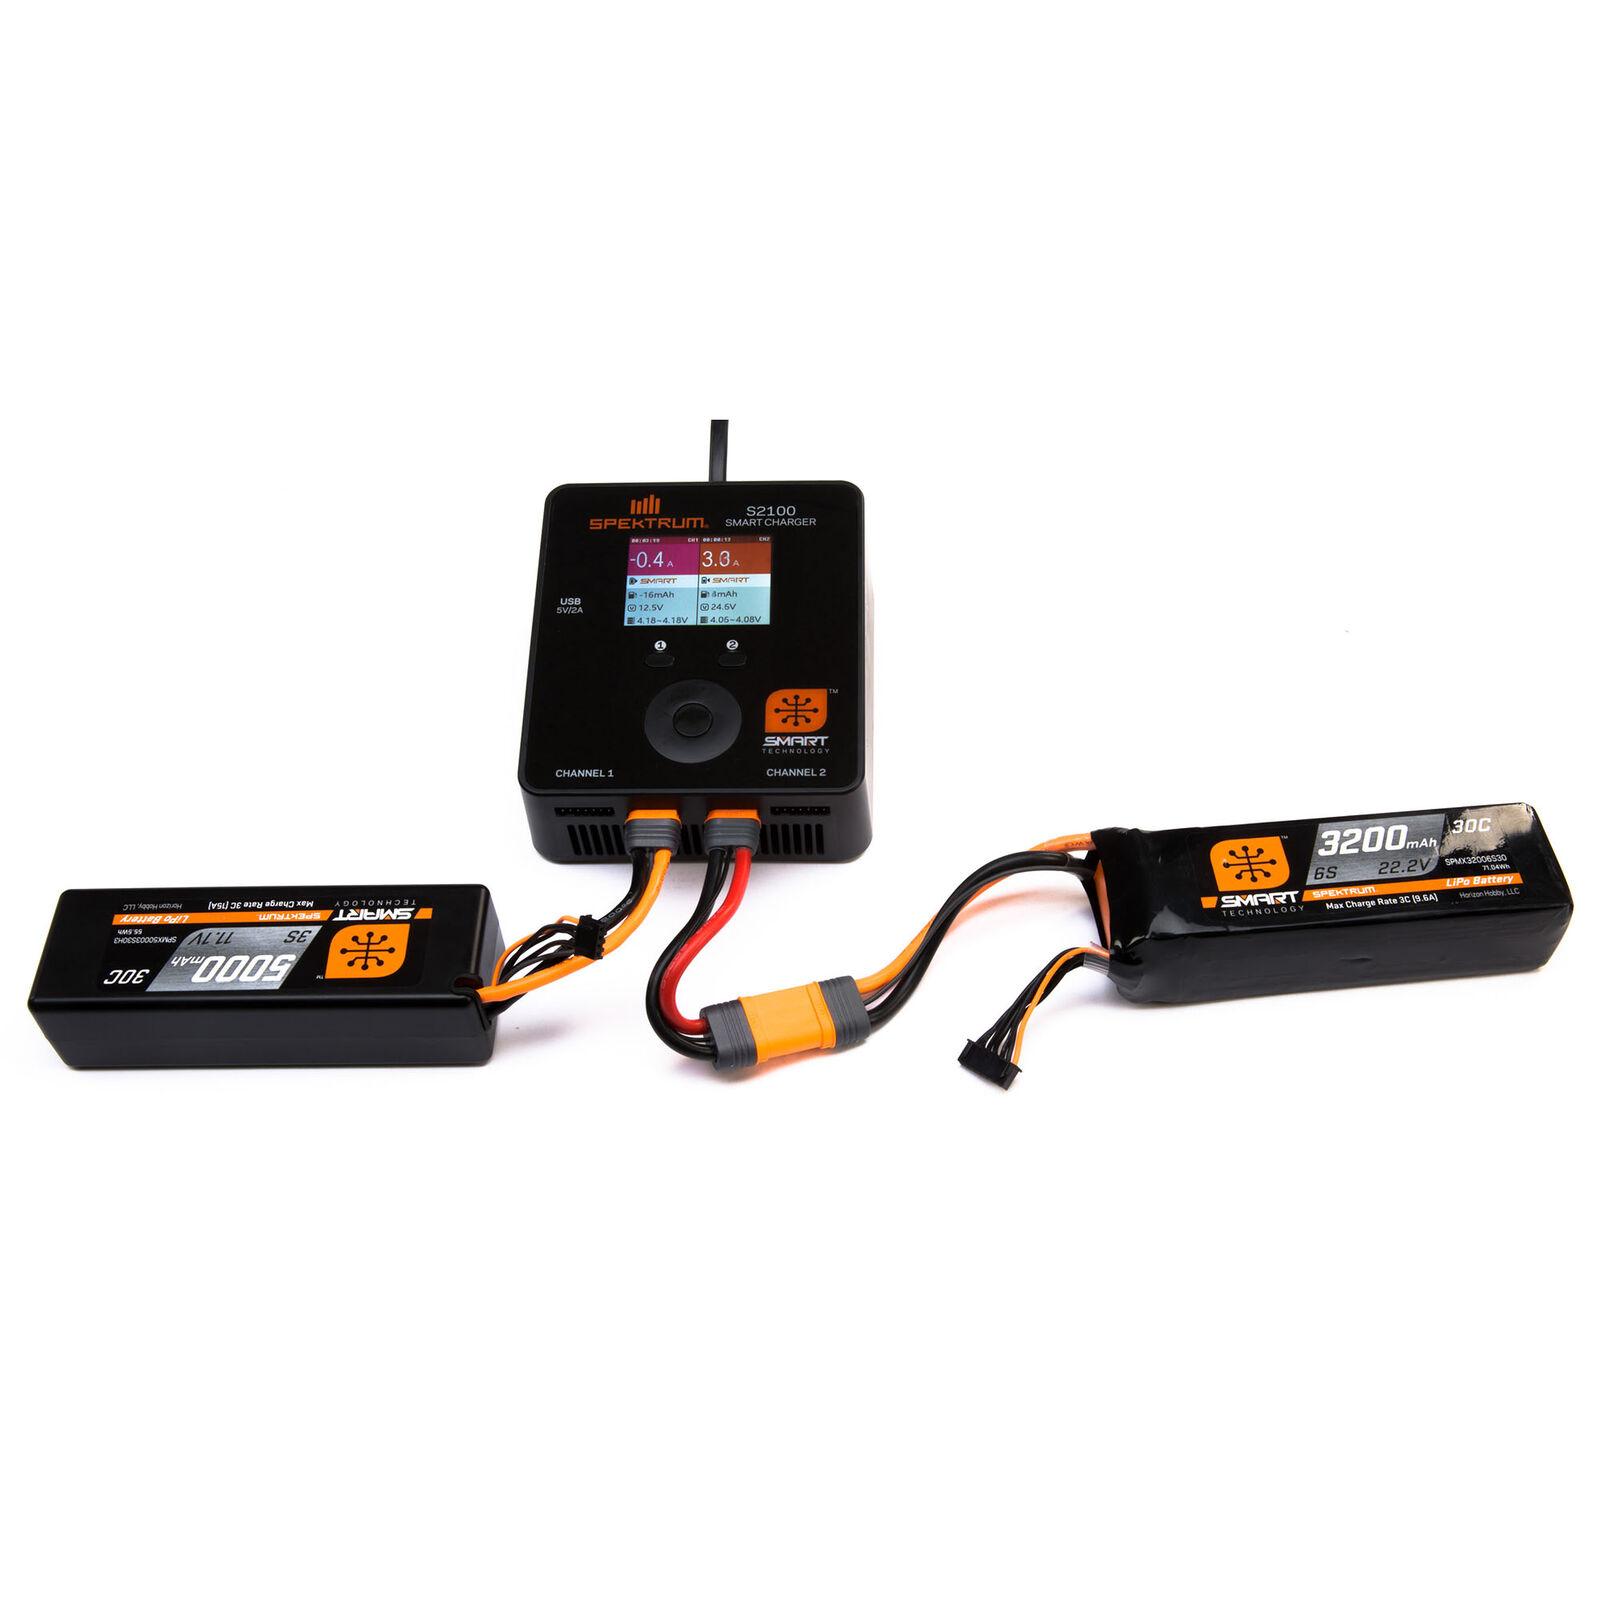 22.2V 5000mAh 6S 30C Smart LiPo Battery: IC5